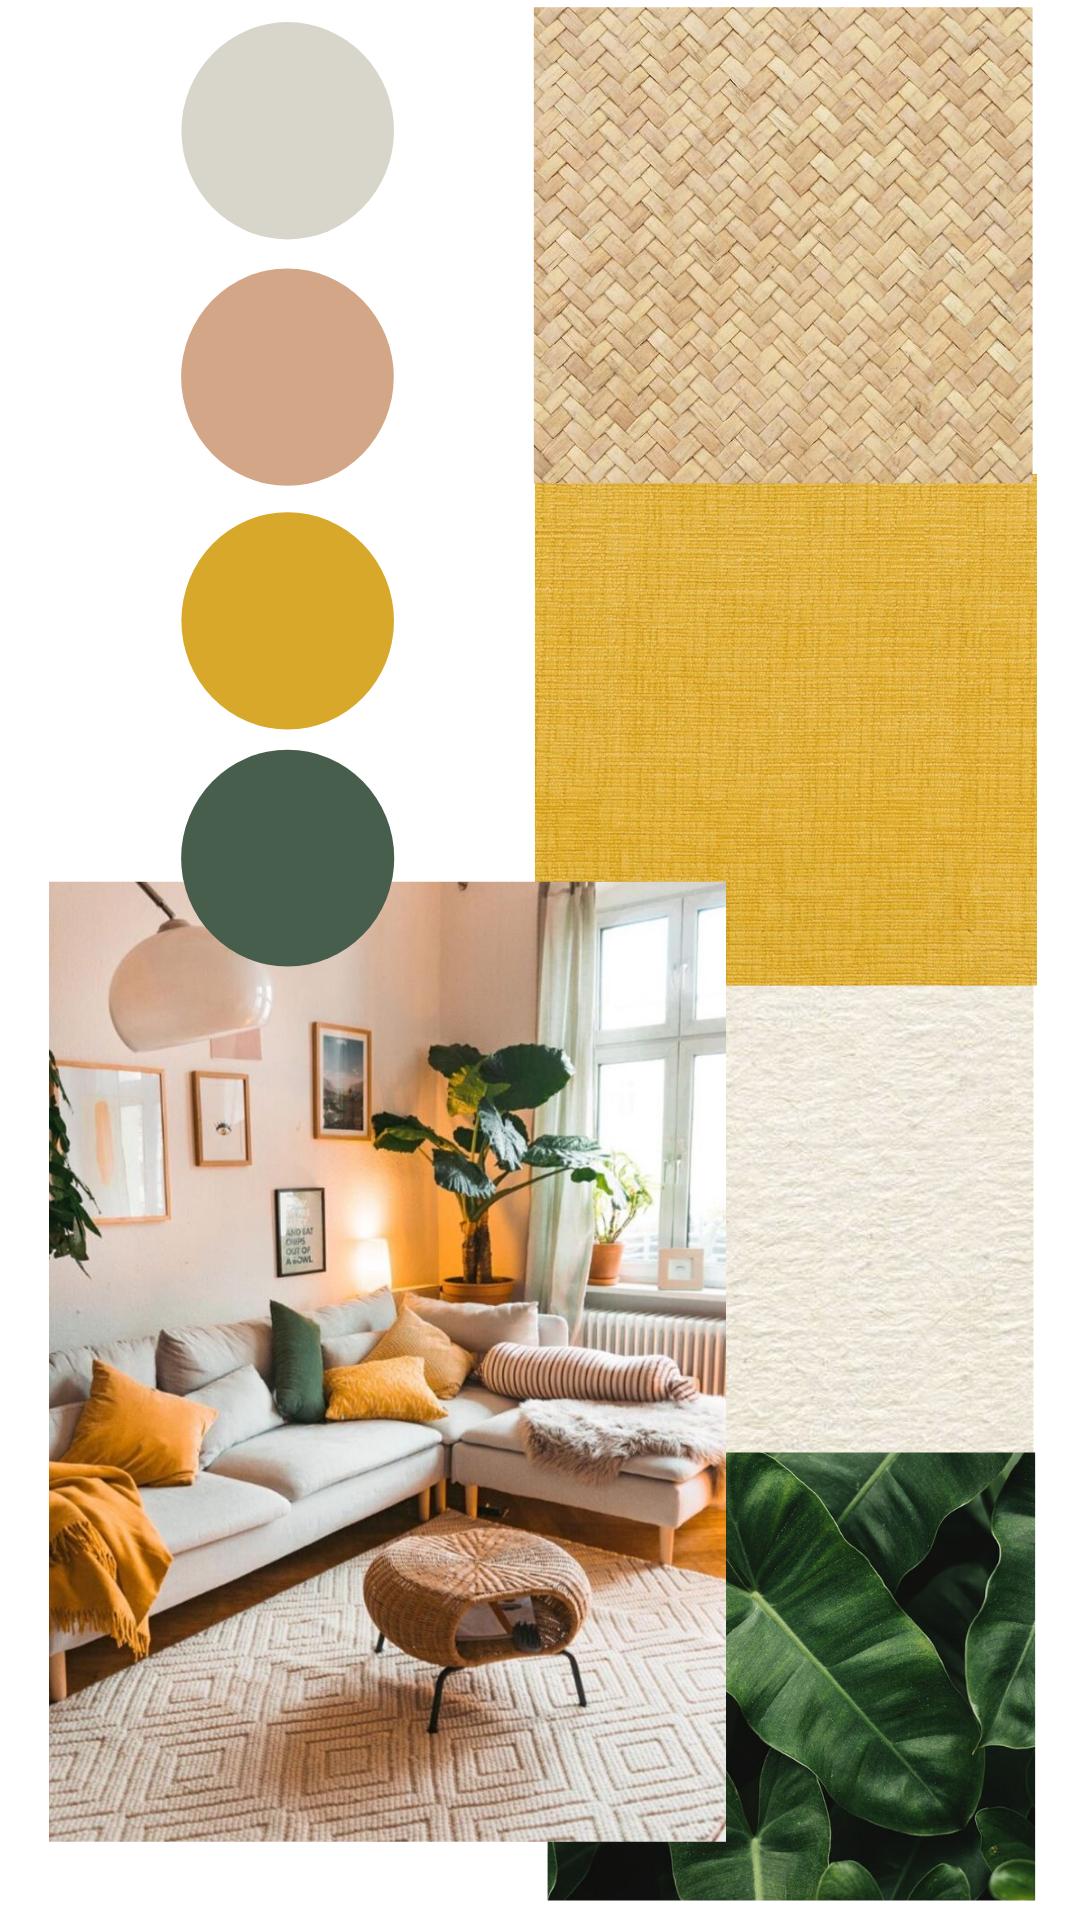 Como Combinar Colores Decoracion Dekohi Living Room Decor Apartment Living Room Color Room Color Schemes